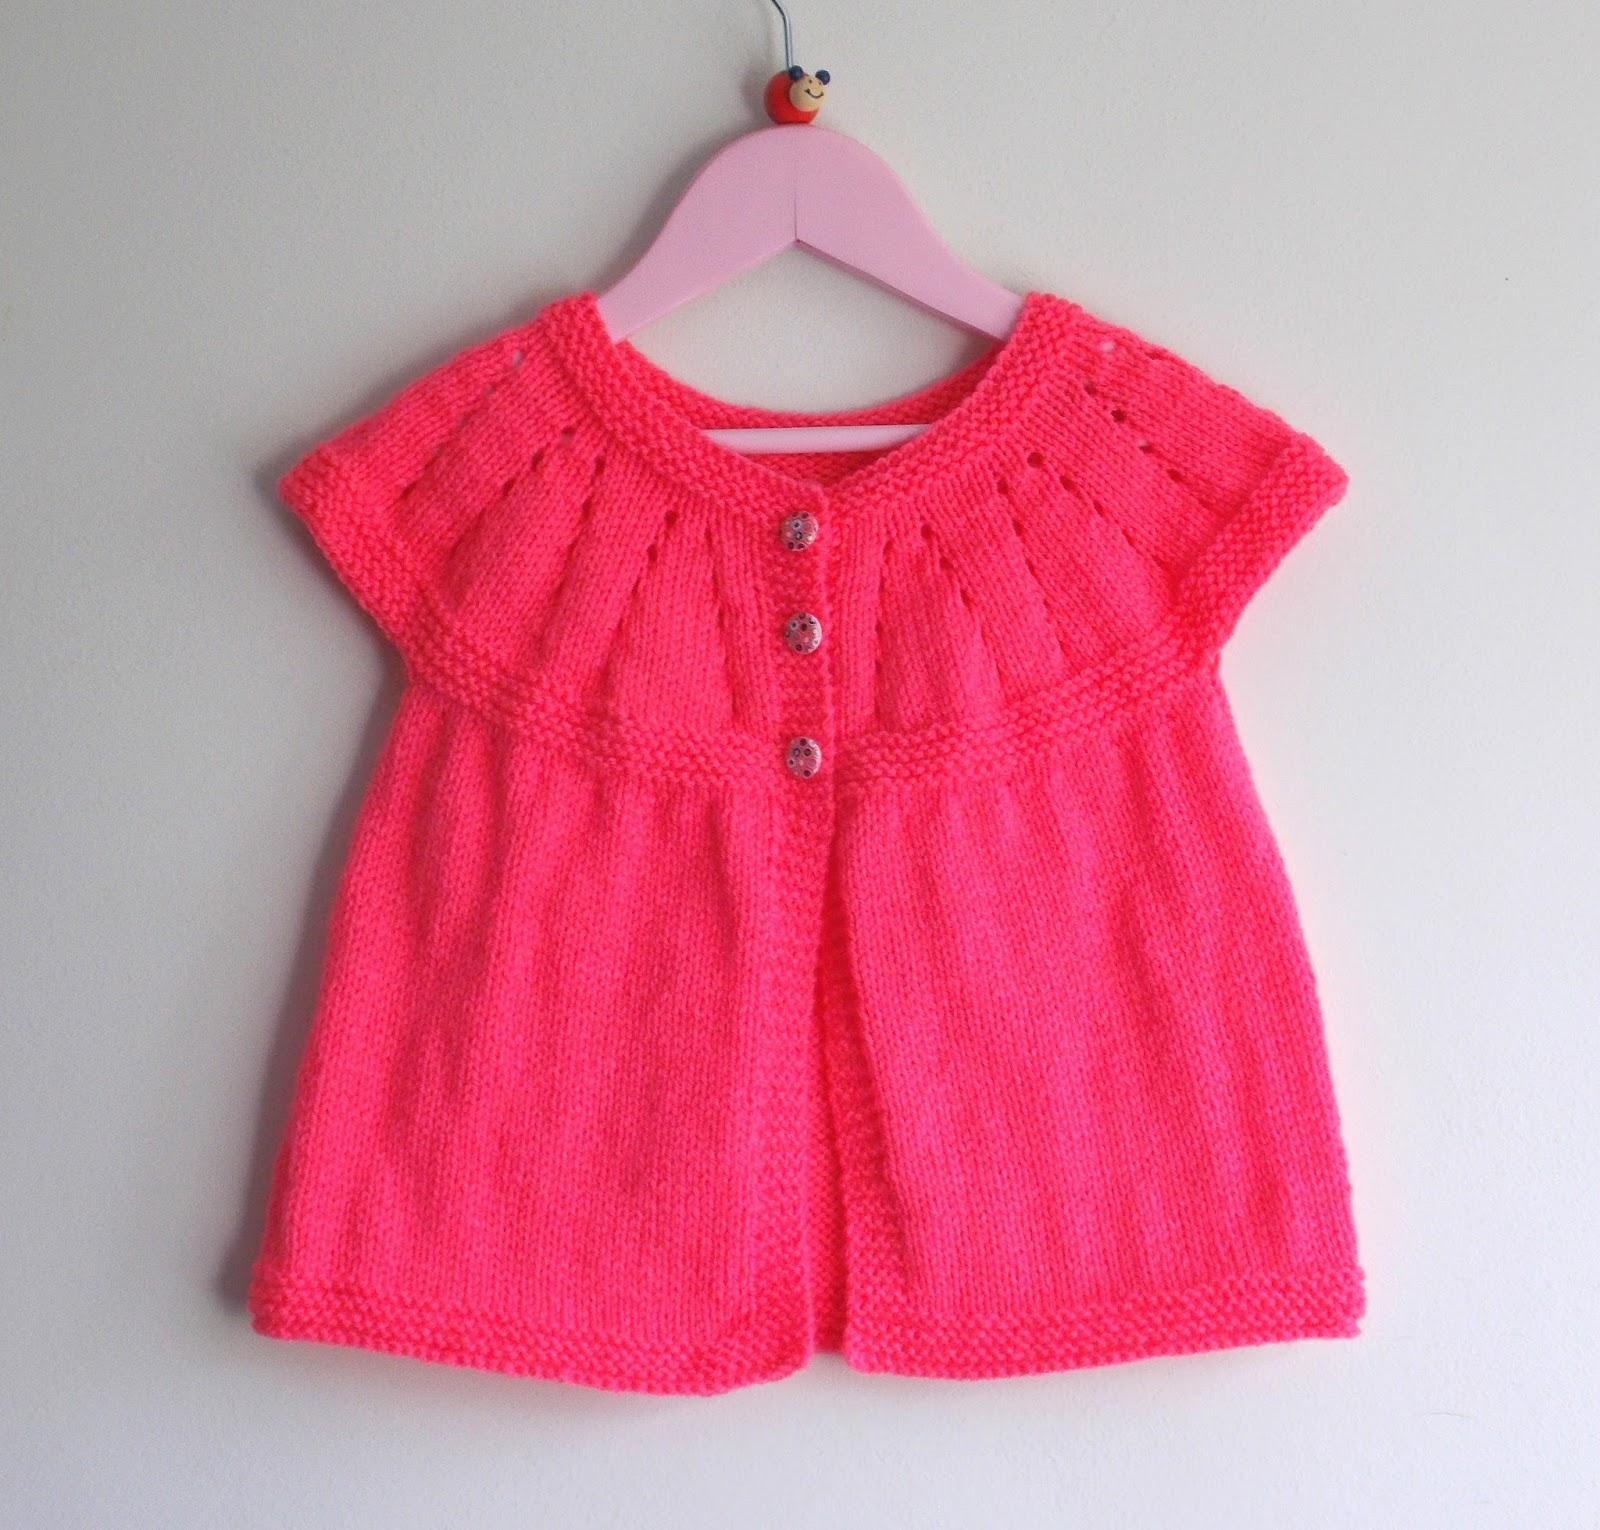 cfc17018e made-by-marianna  My Free Knitting Patterns